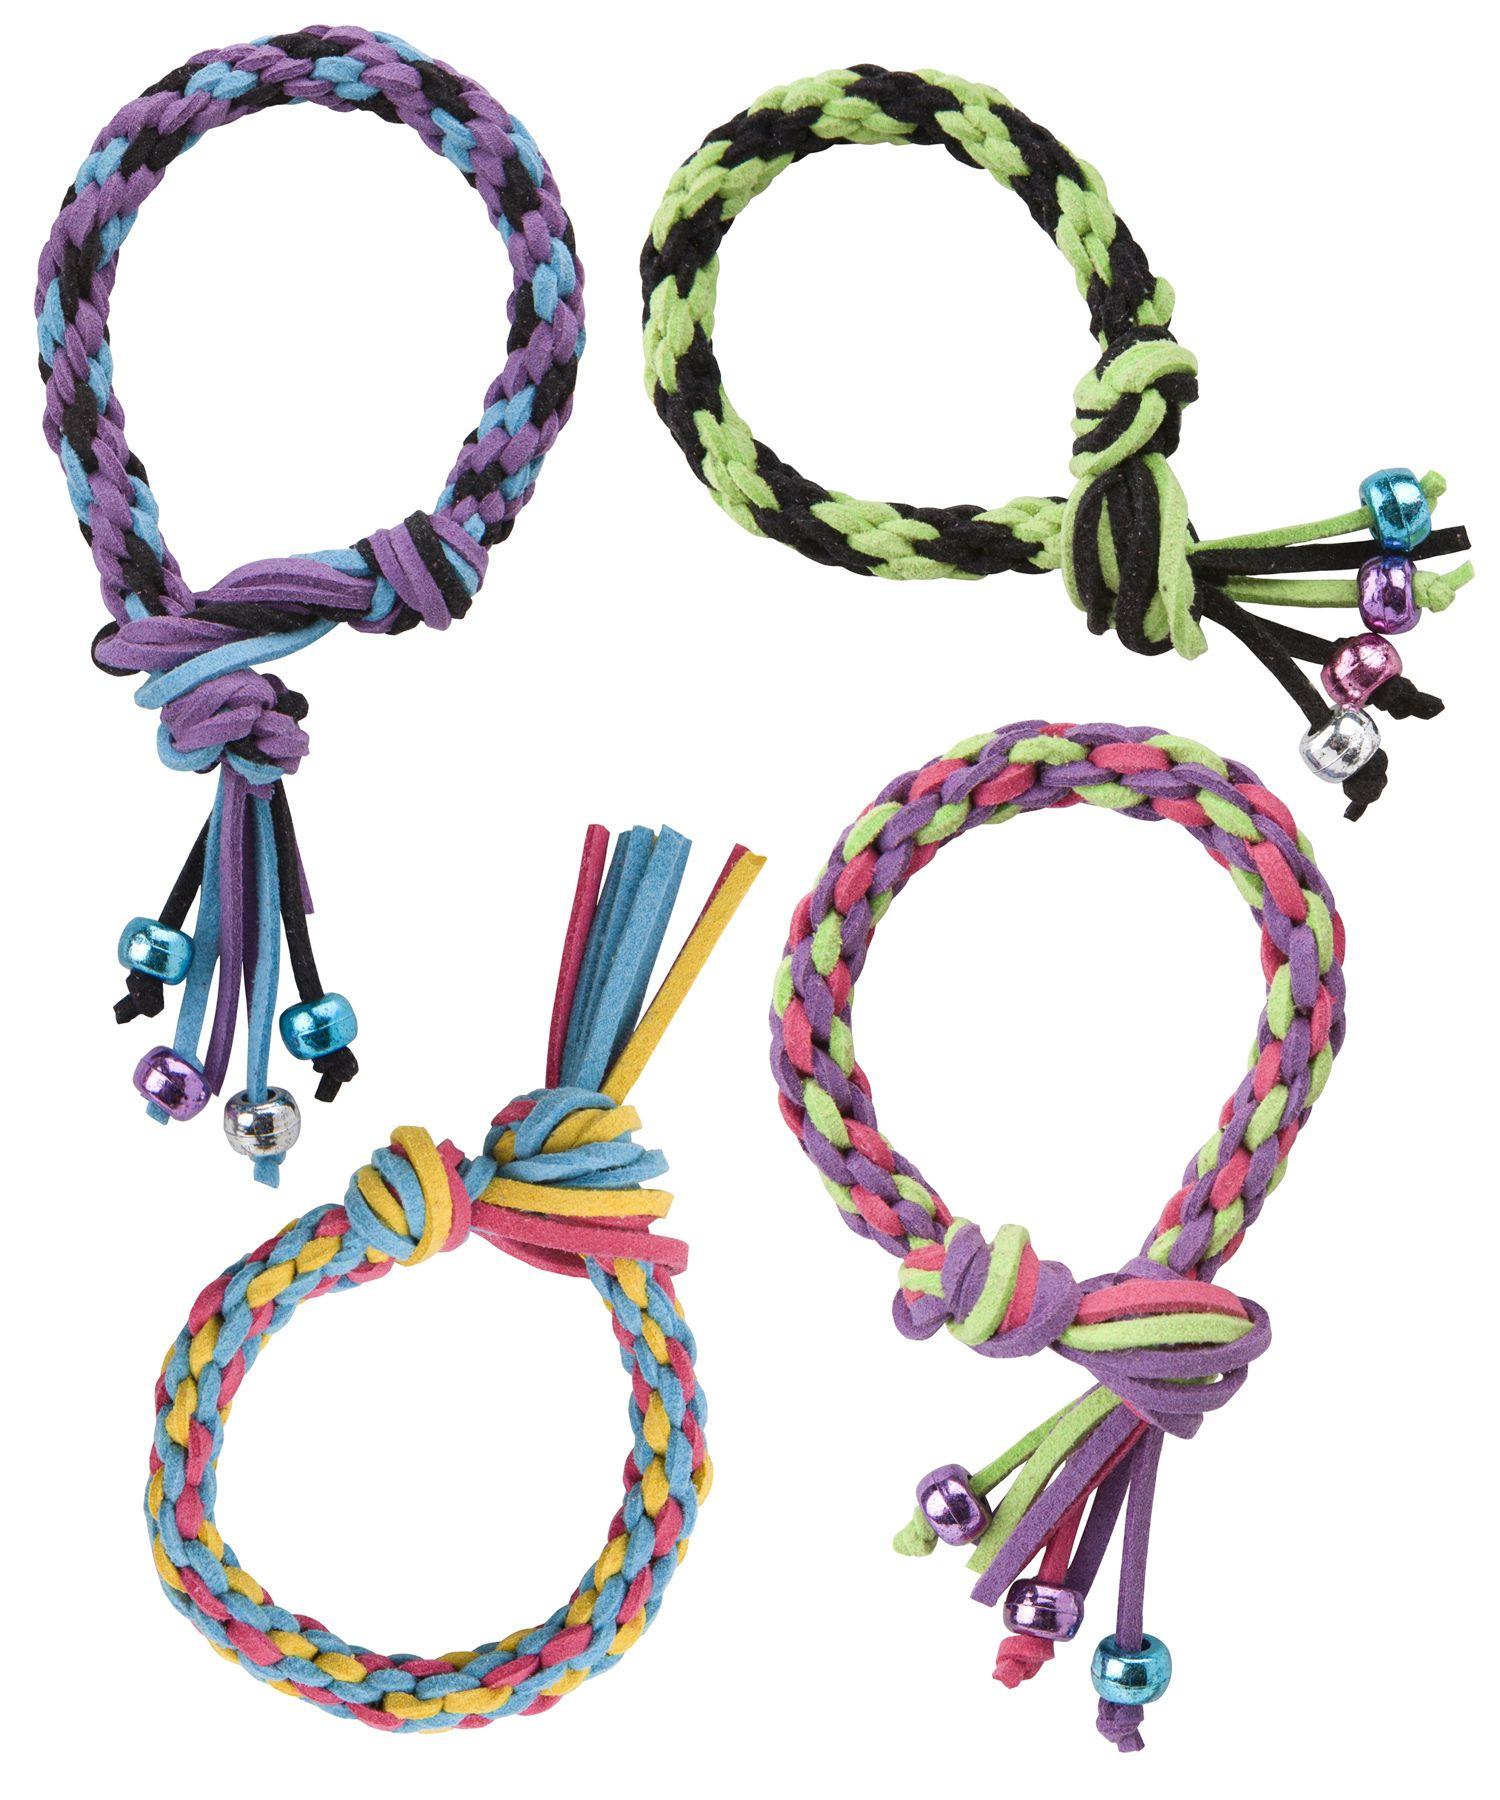 Alex toys doityourself wear faux leather friendship bracelets kit